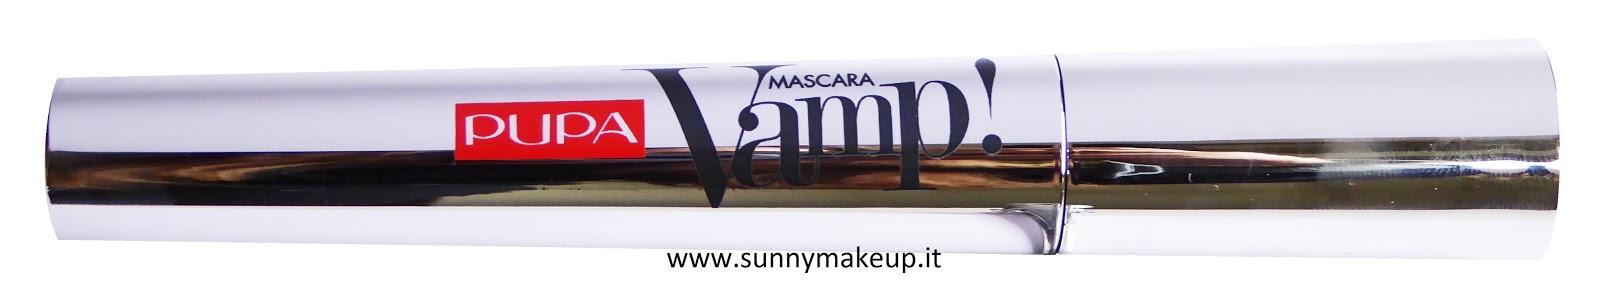 Pupa - Vamp! Mascara.  100 Vamp! Extra Black.